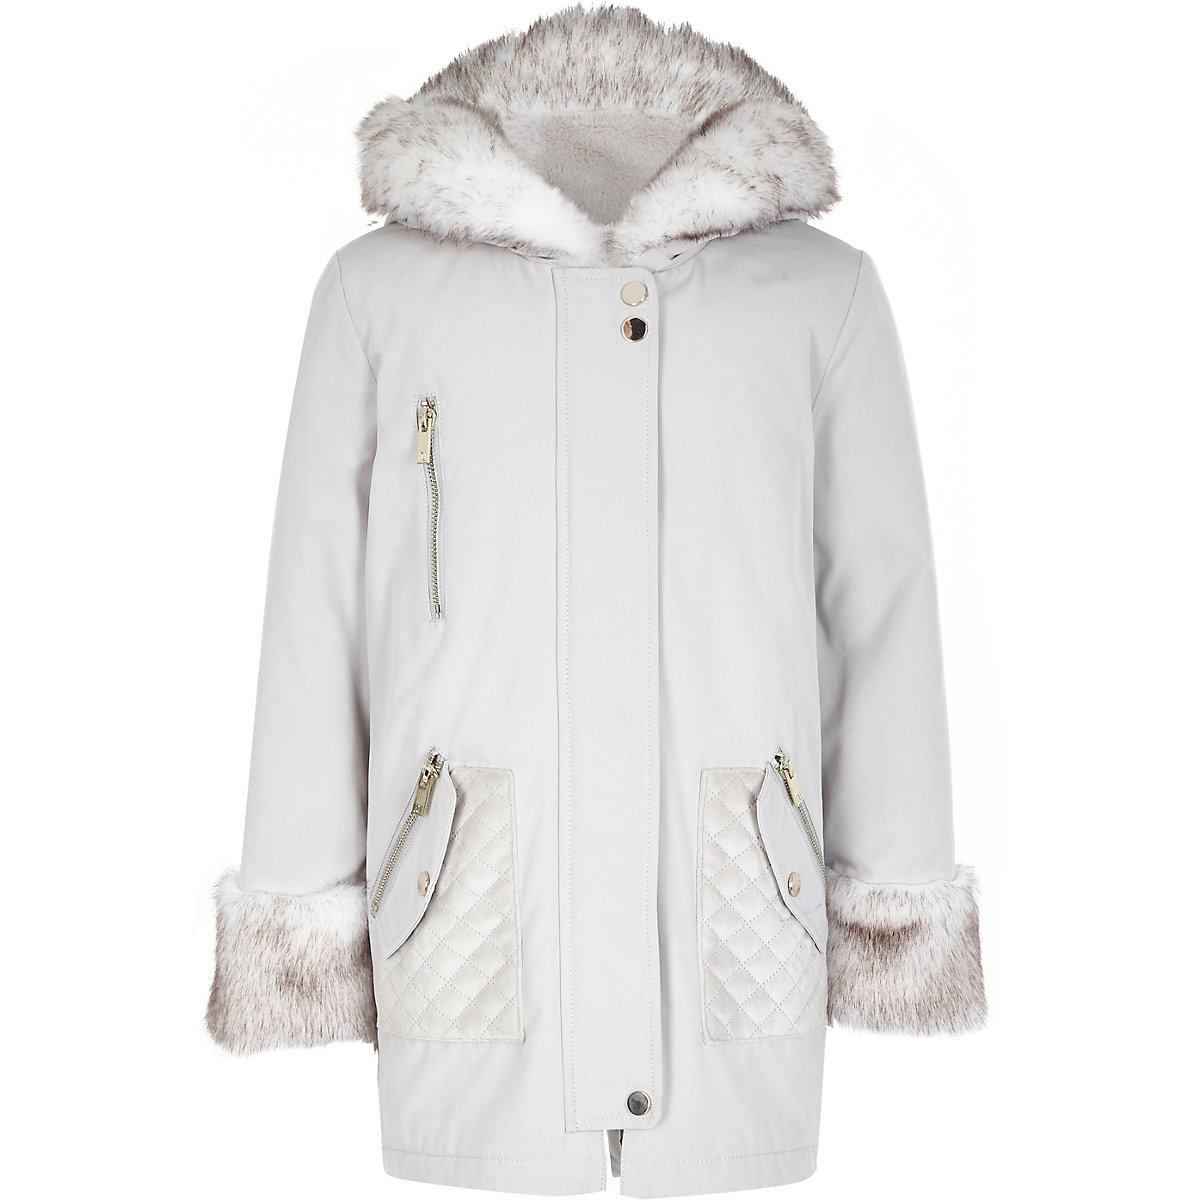 Girls cream faux fur trim parka jacket